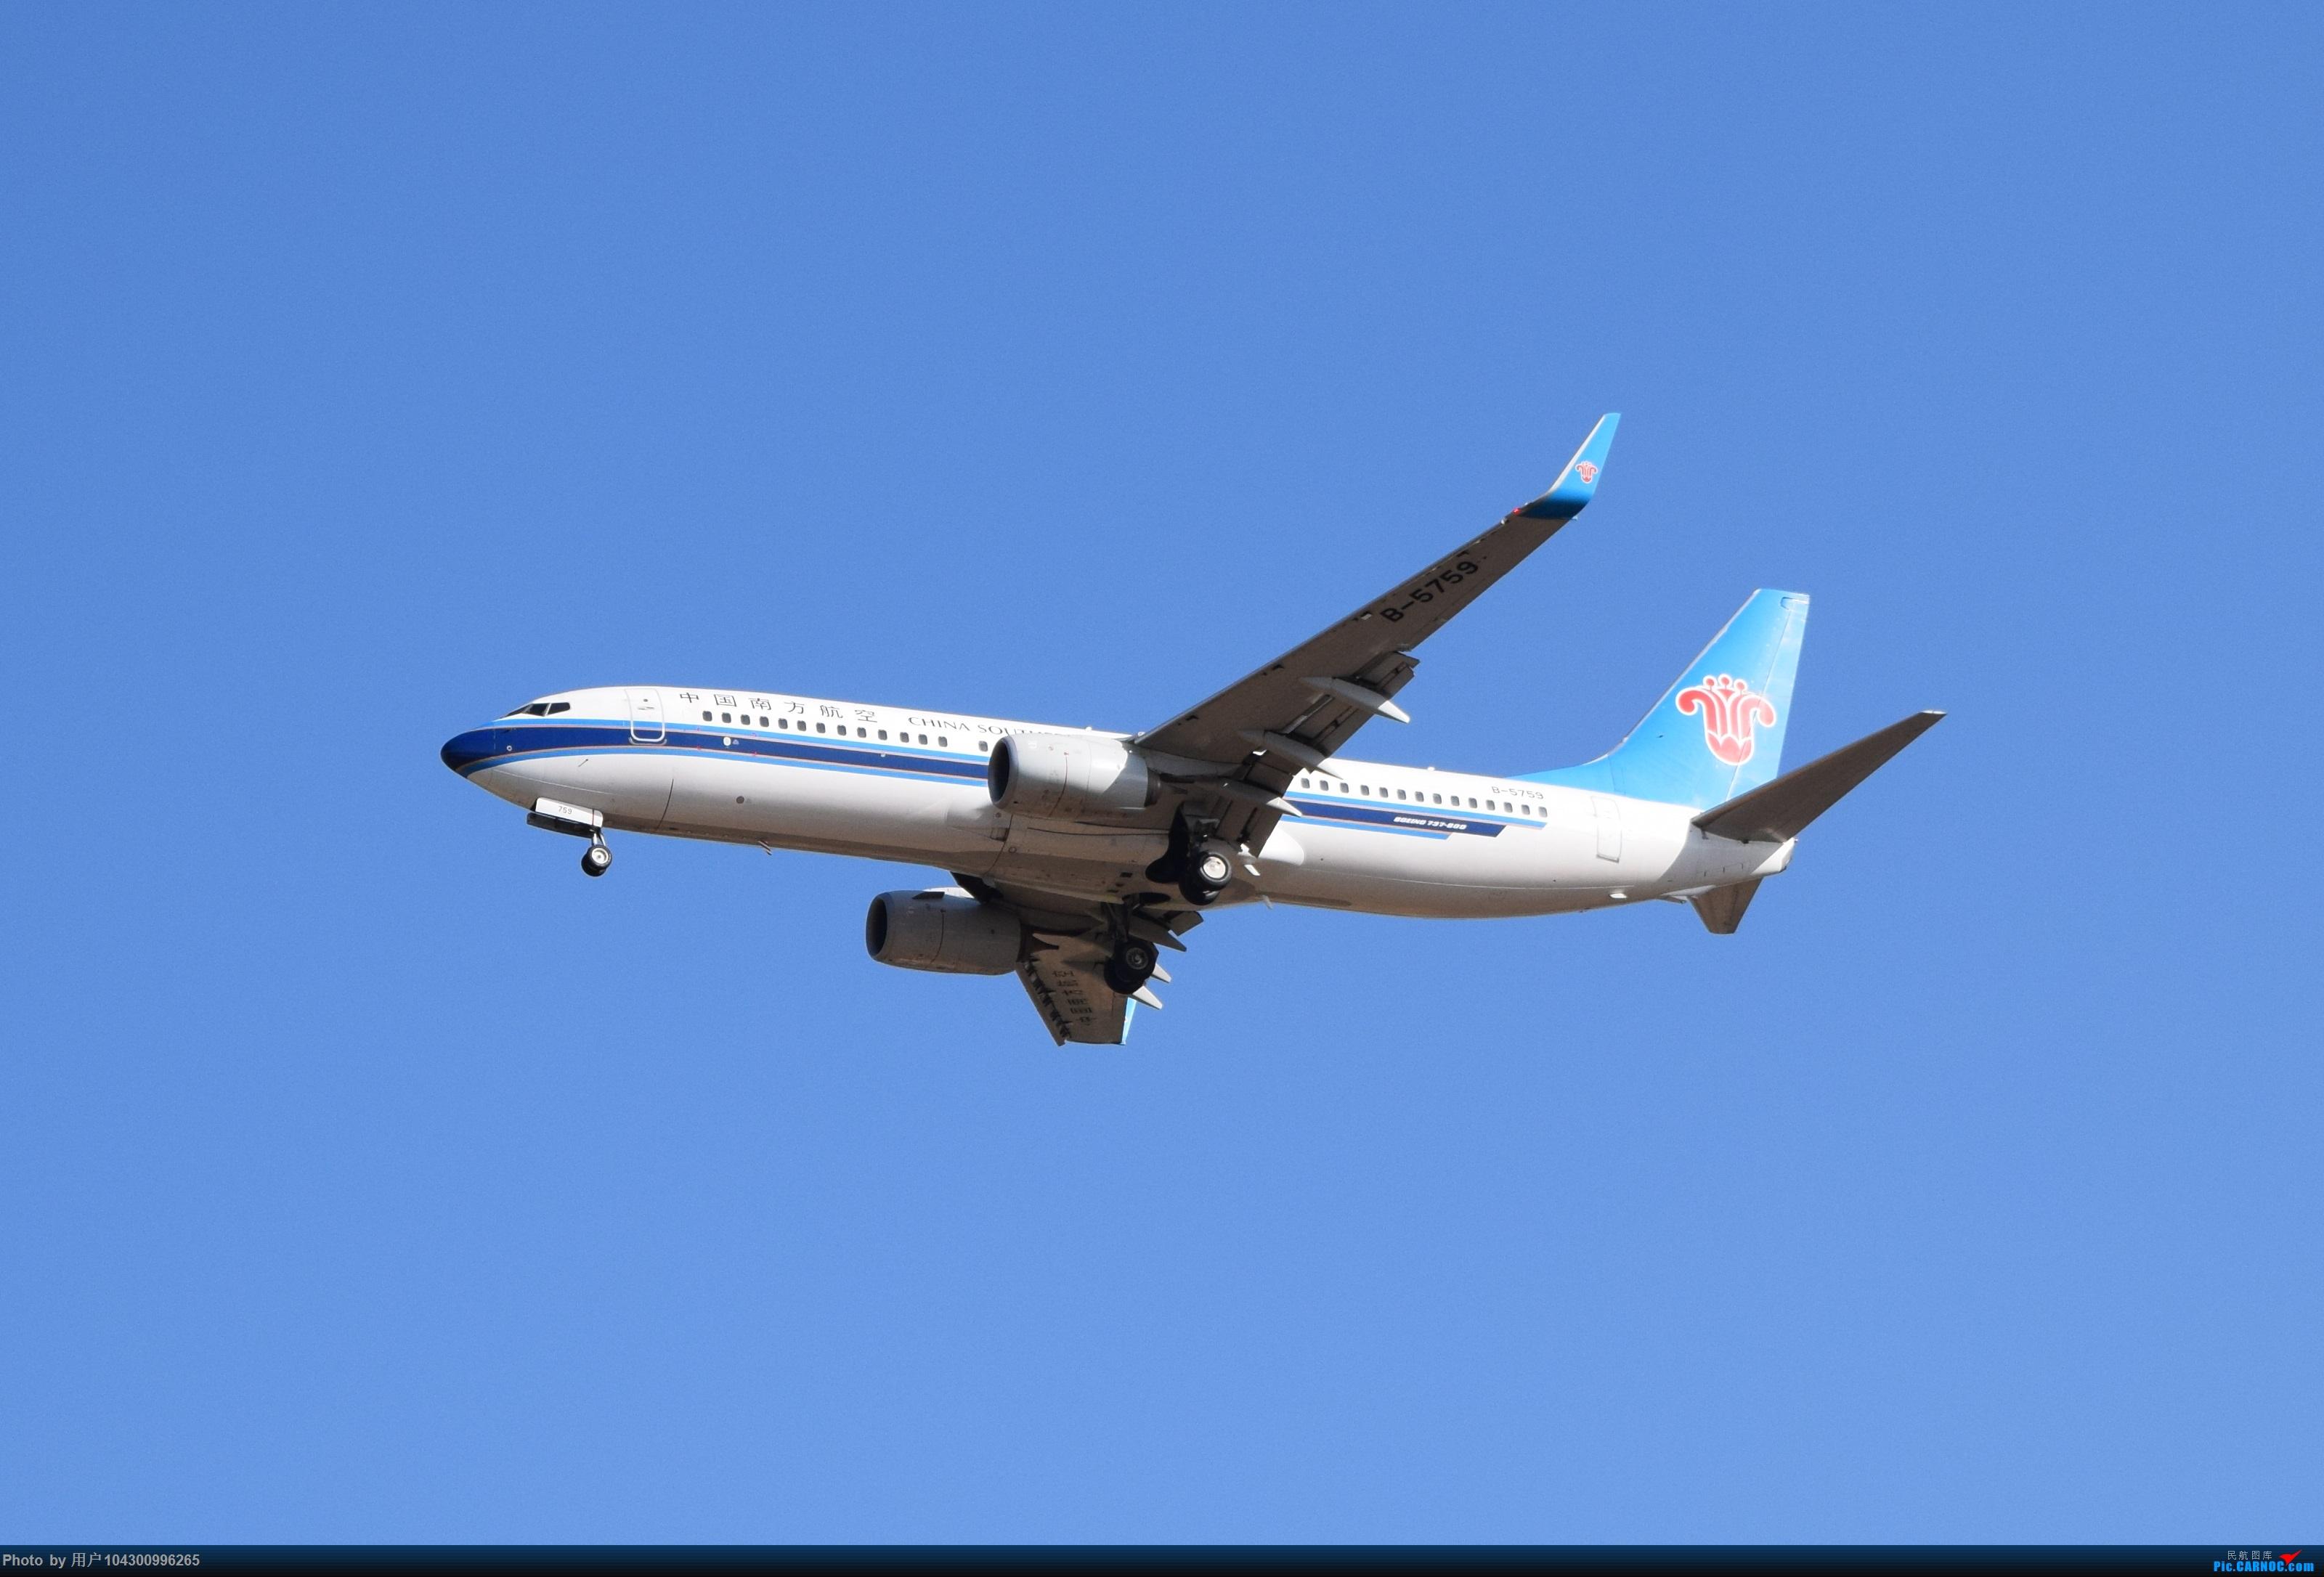 Re:[原创][KWE]贵阳今天天气不错,随便拍几张! BOEING 737-800 B-5759 中国贵阳龙洞堡国际机场